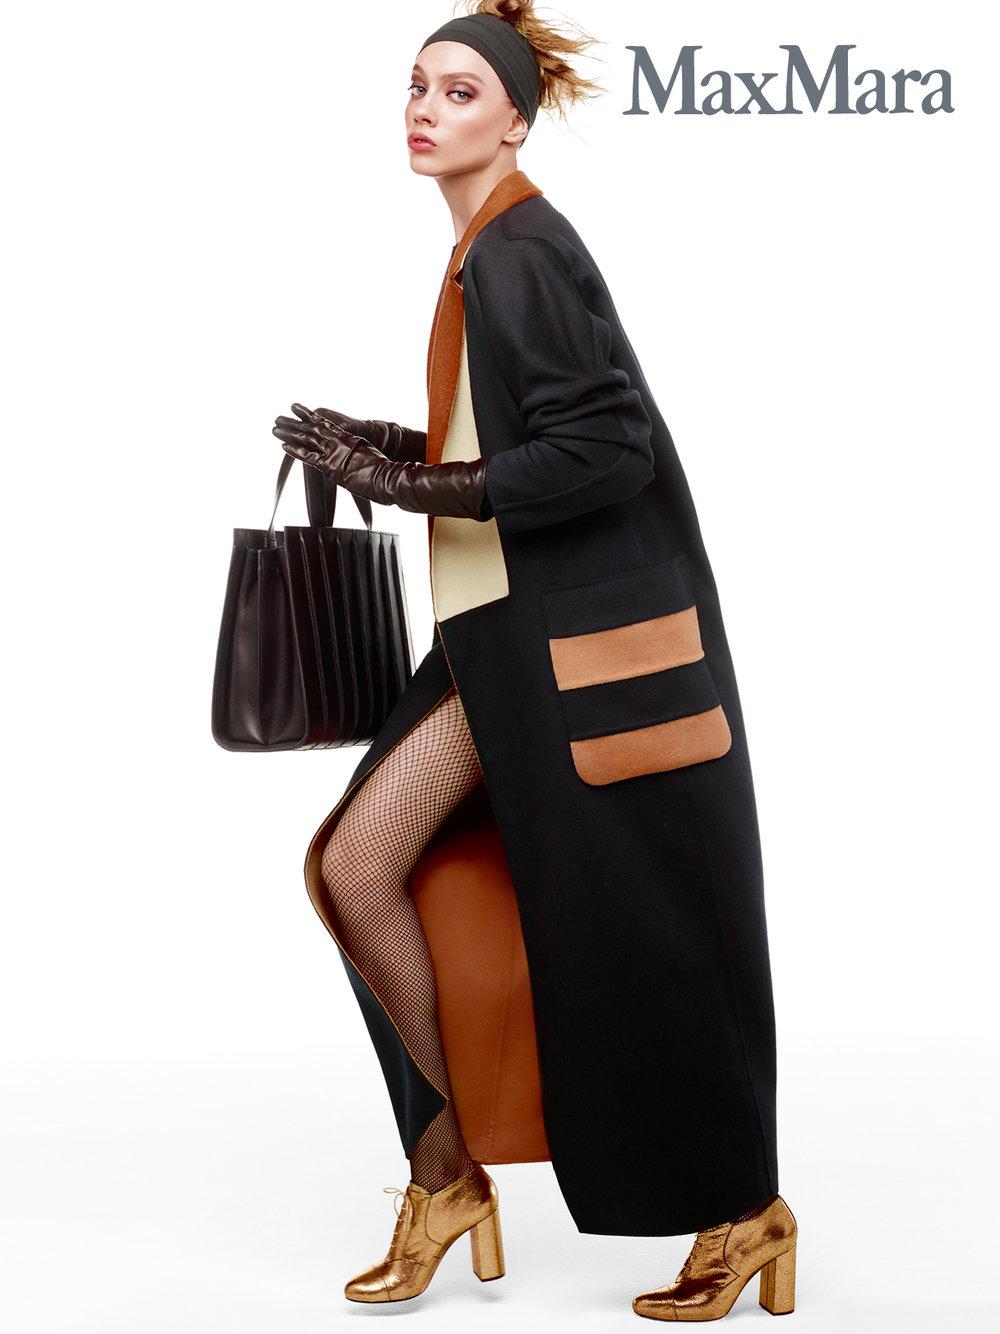 #maxmara #fw16 #stevenmeisel #carineroitfeld #odettepavlova #fashion #campaign #jimkaemmerling #patmcgrath #guidopalau